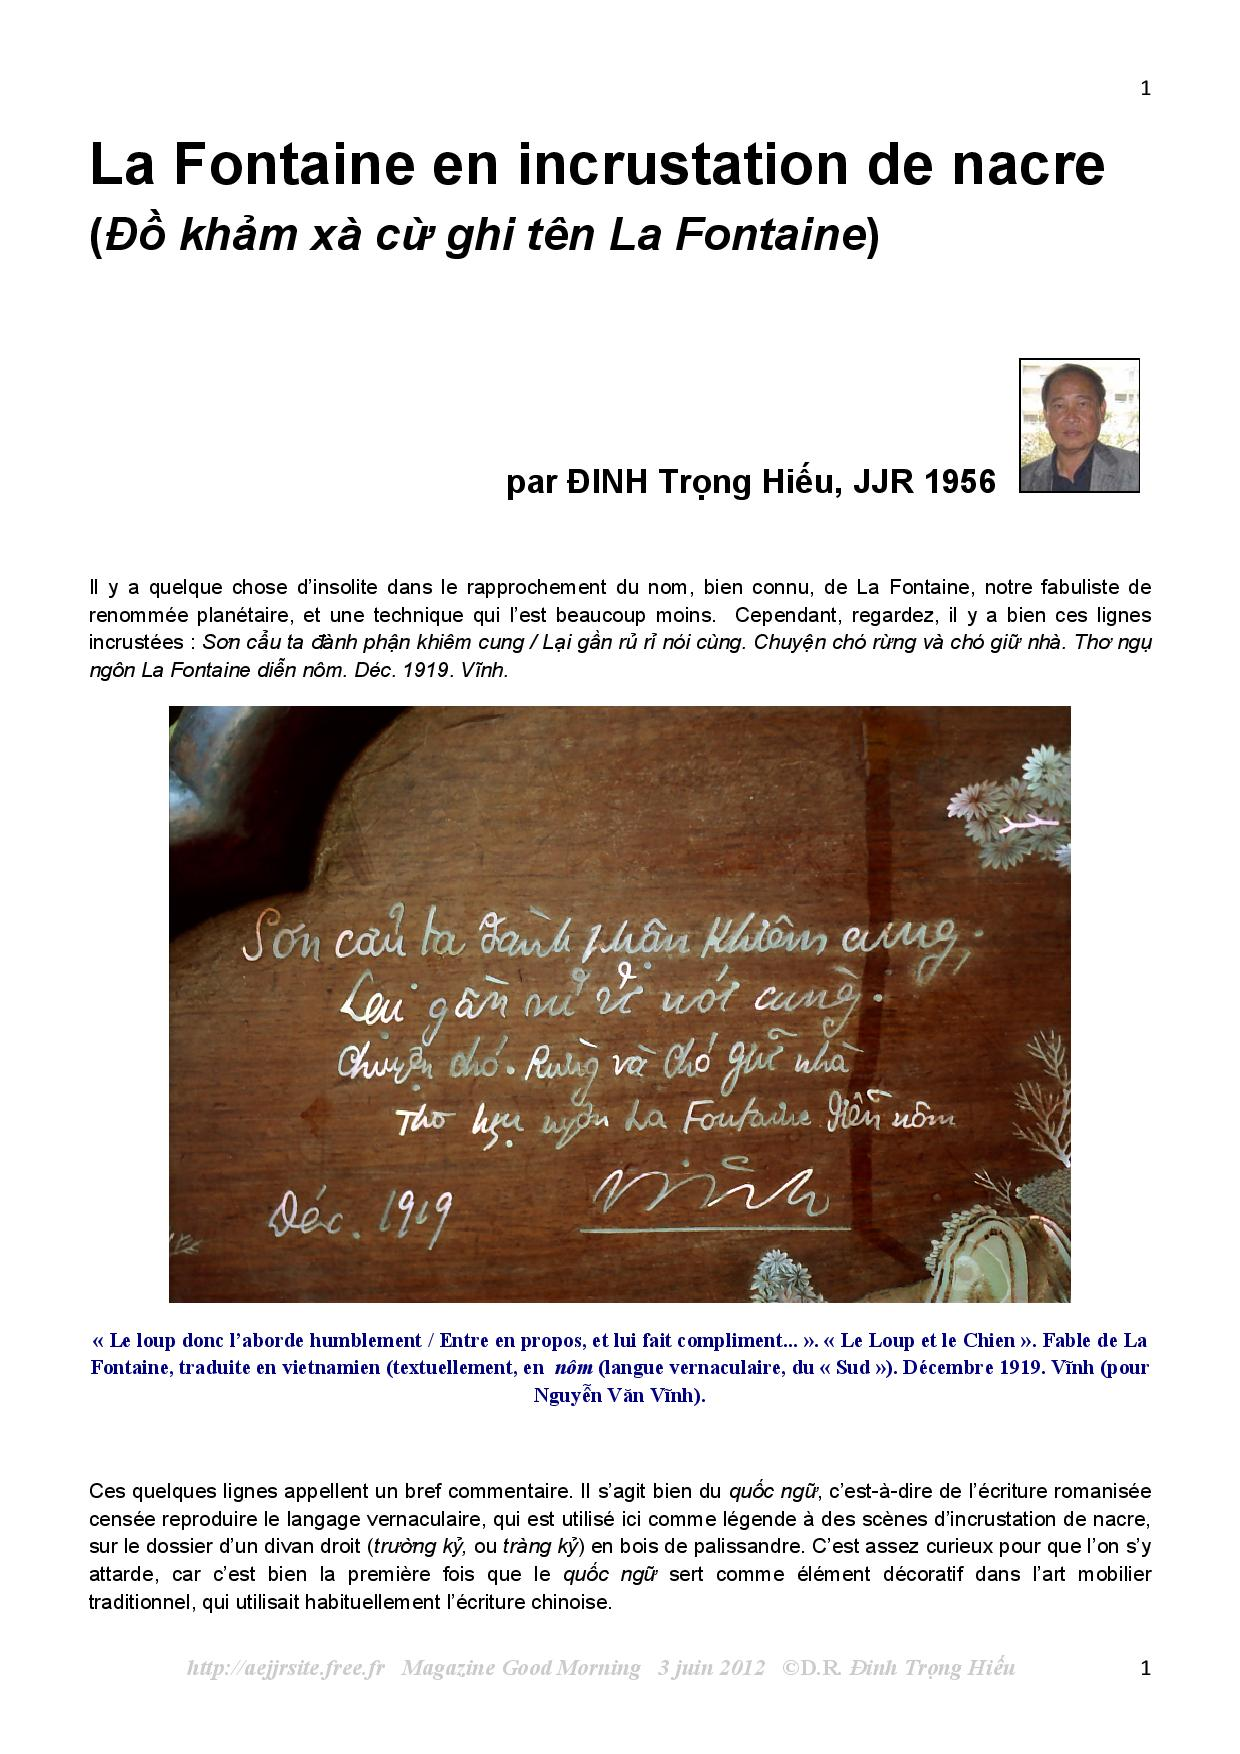 gm134_lafontaineincrustationnacre-page-001